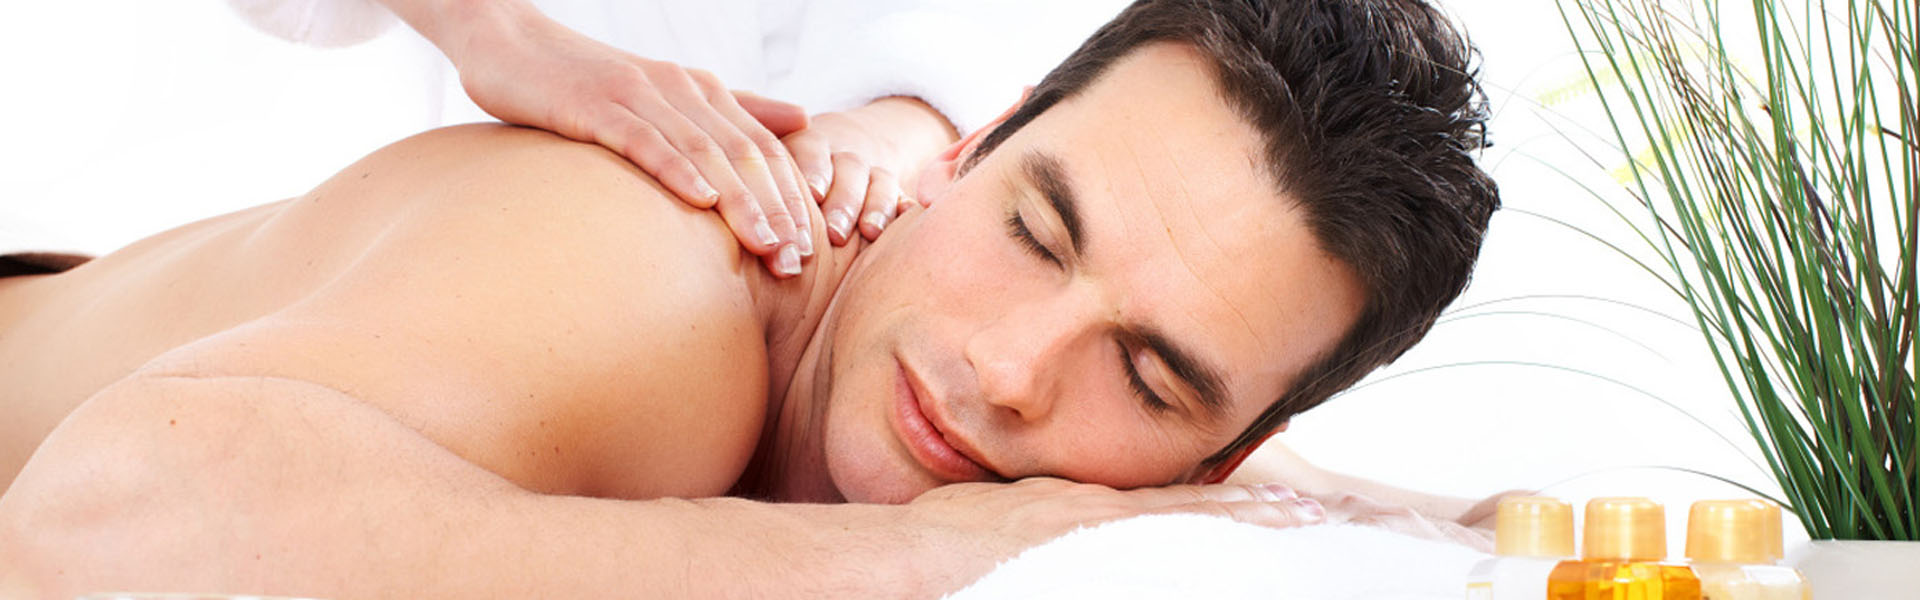 madhuspa, blog, massagem relaxante,